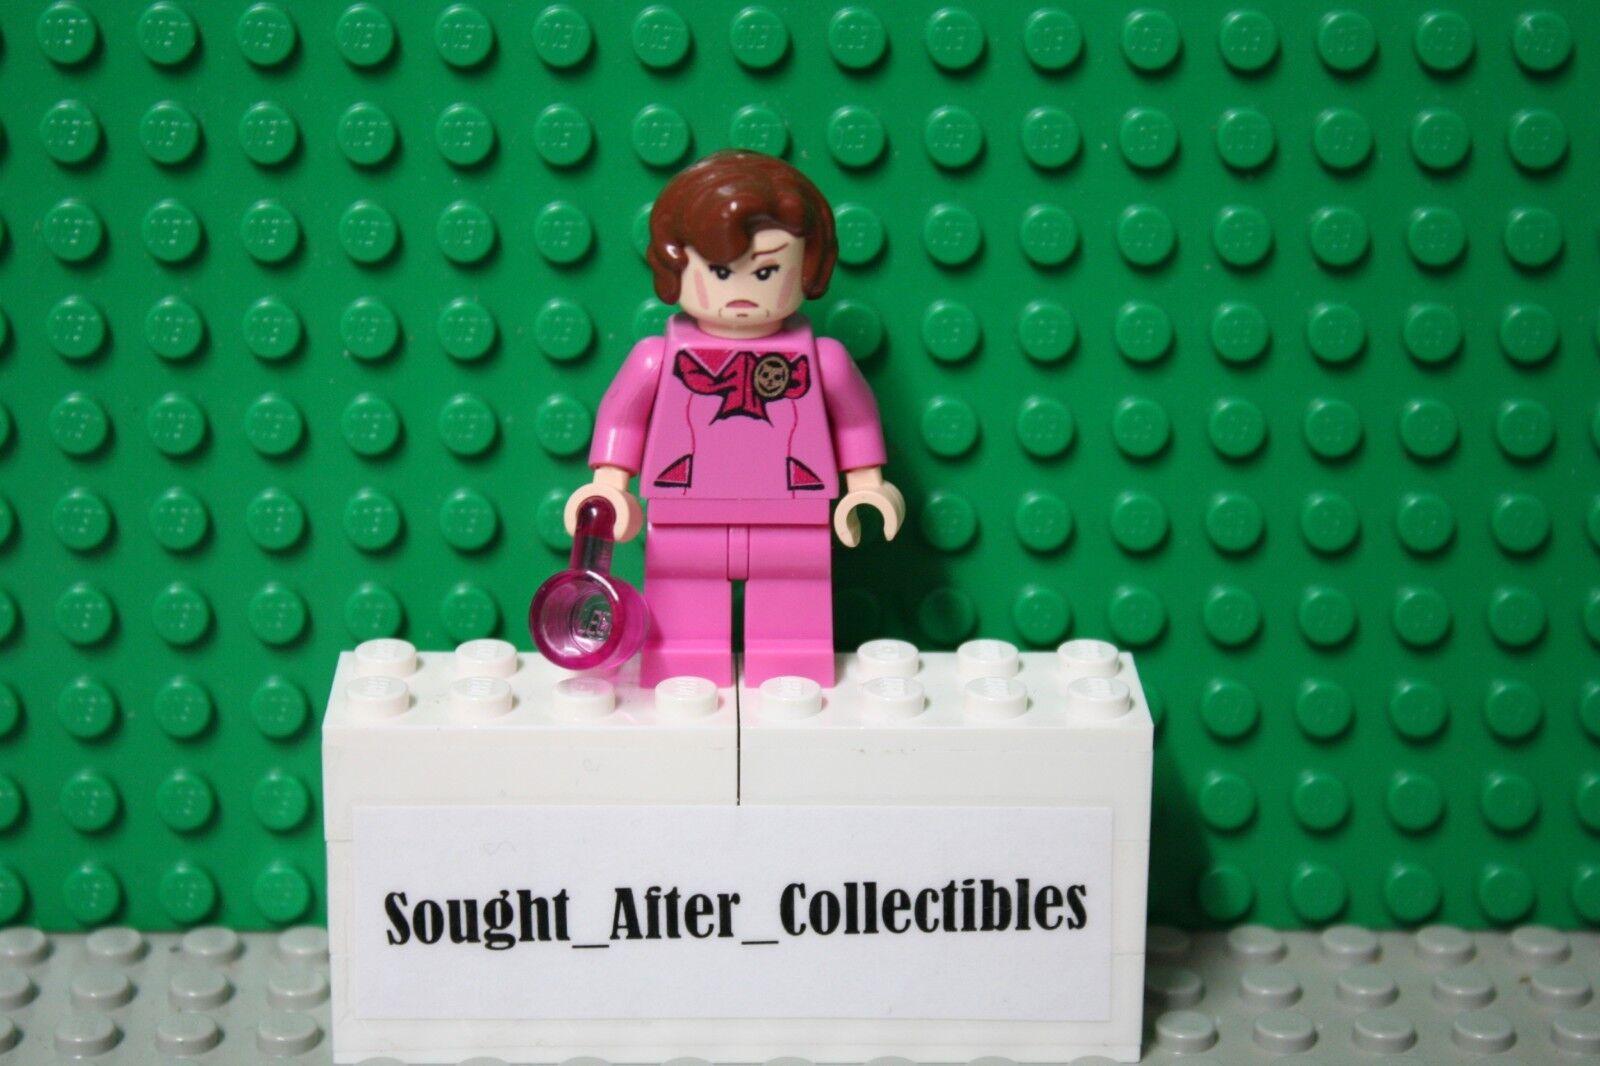 LEGO Professor Dolores Umbridge MINIFIGURE Genuine NEW from Harry Potter 5378